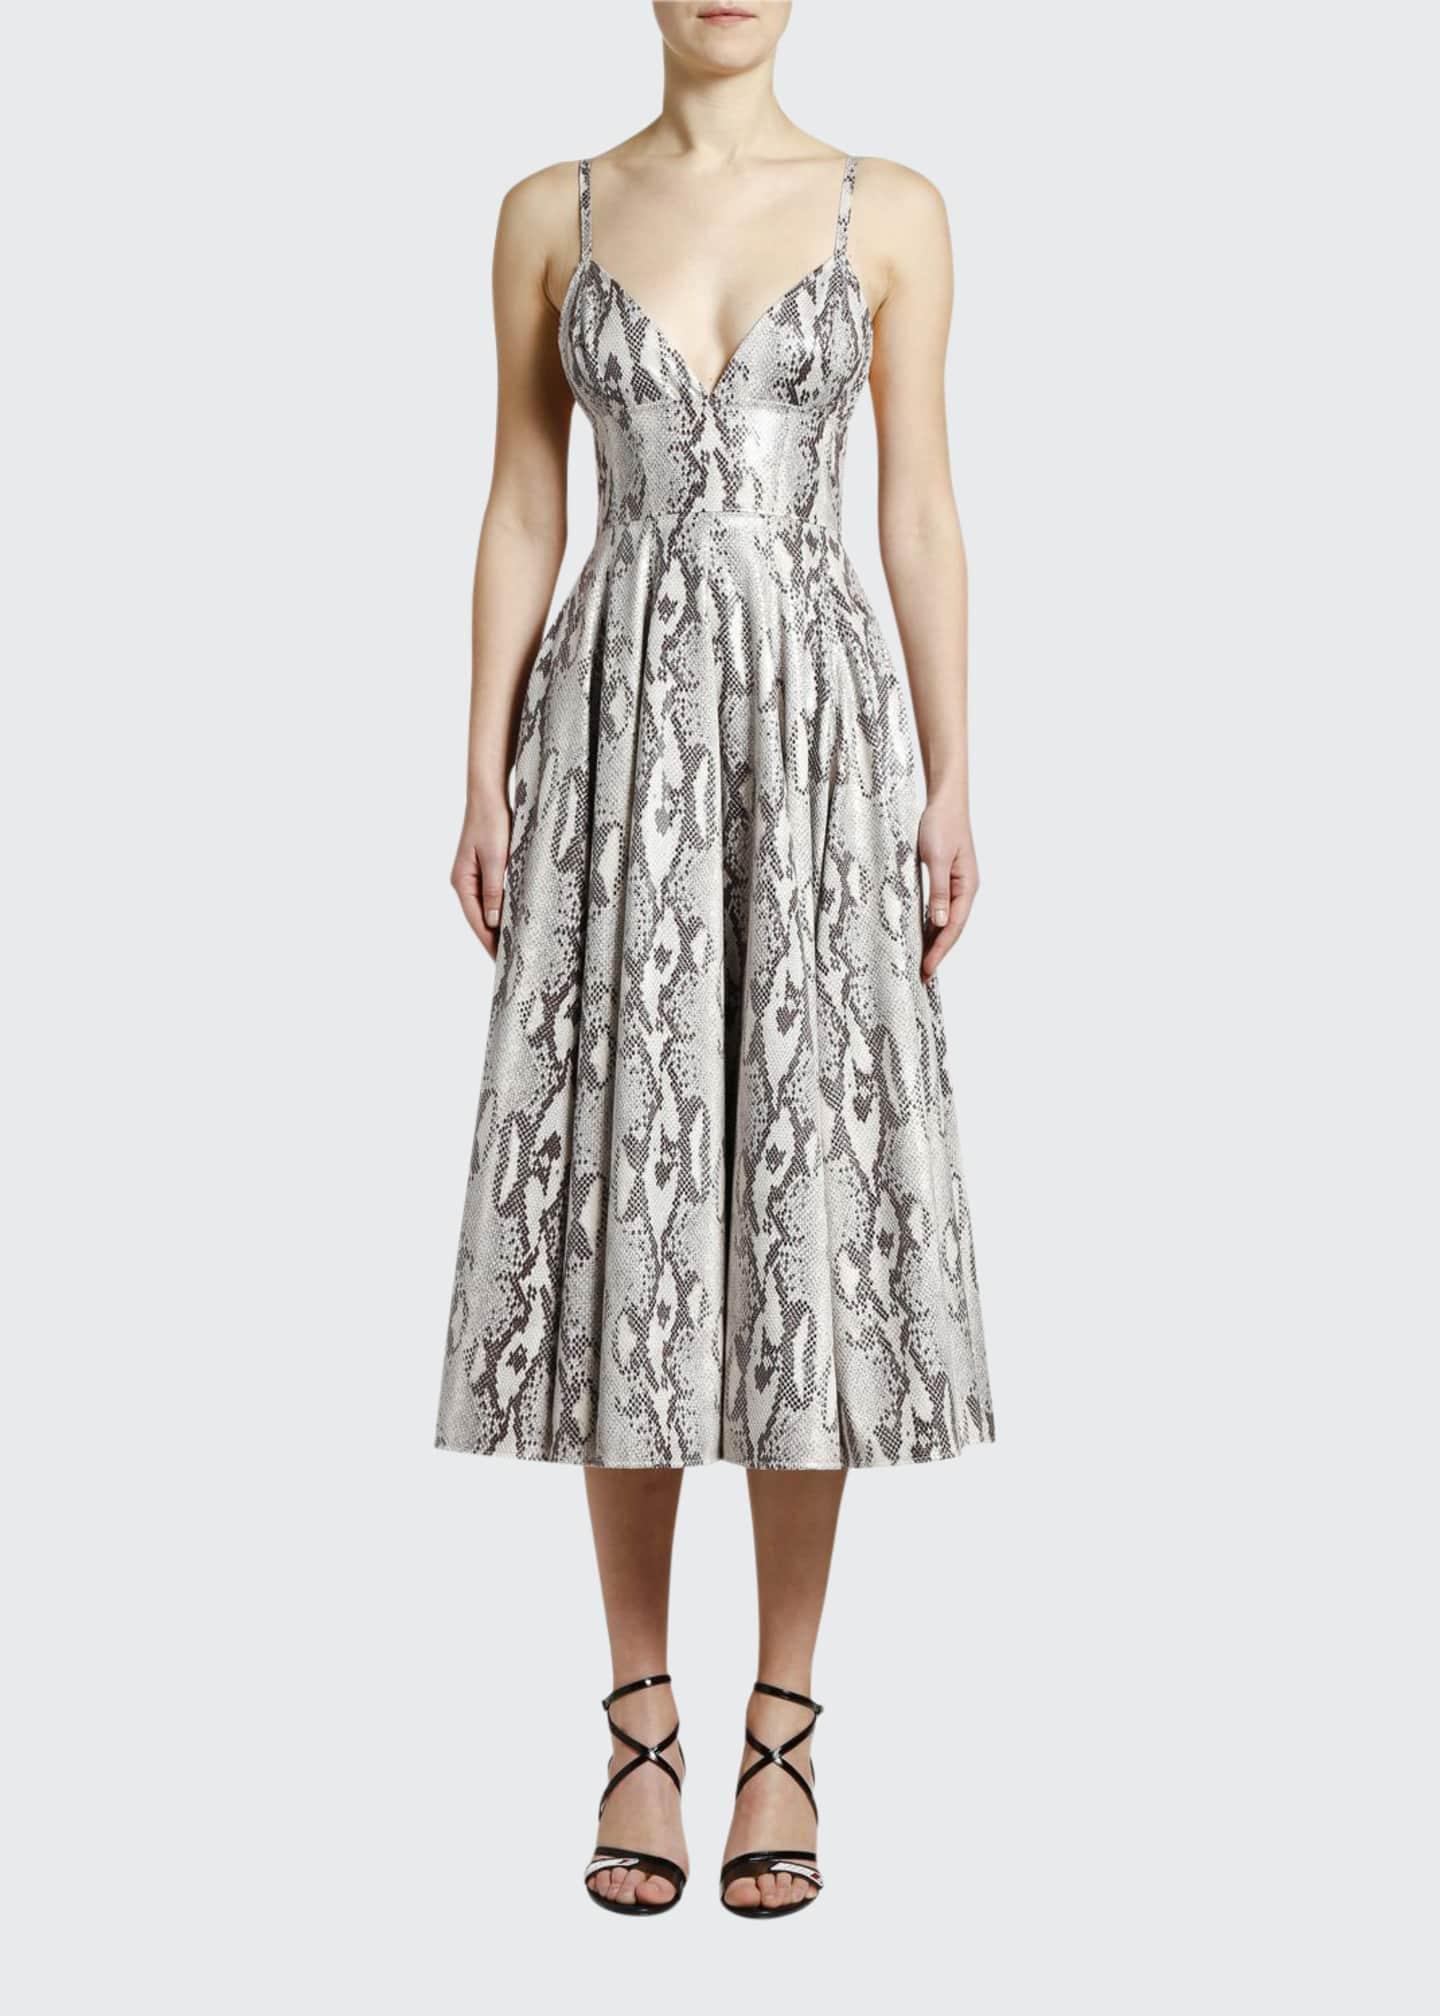 MSGM Python-Print Sleeveless Midi Dress